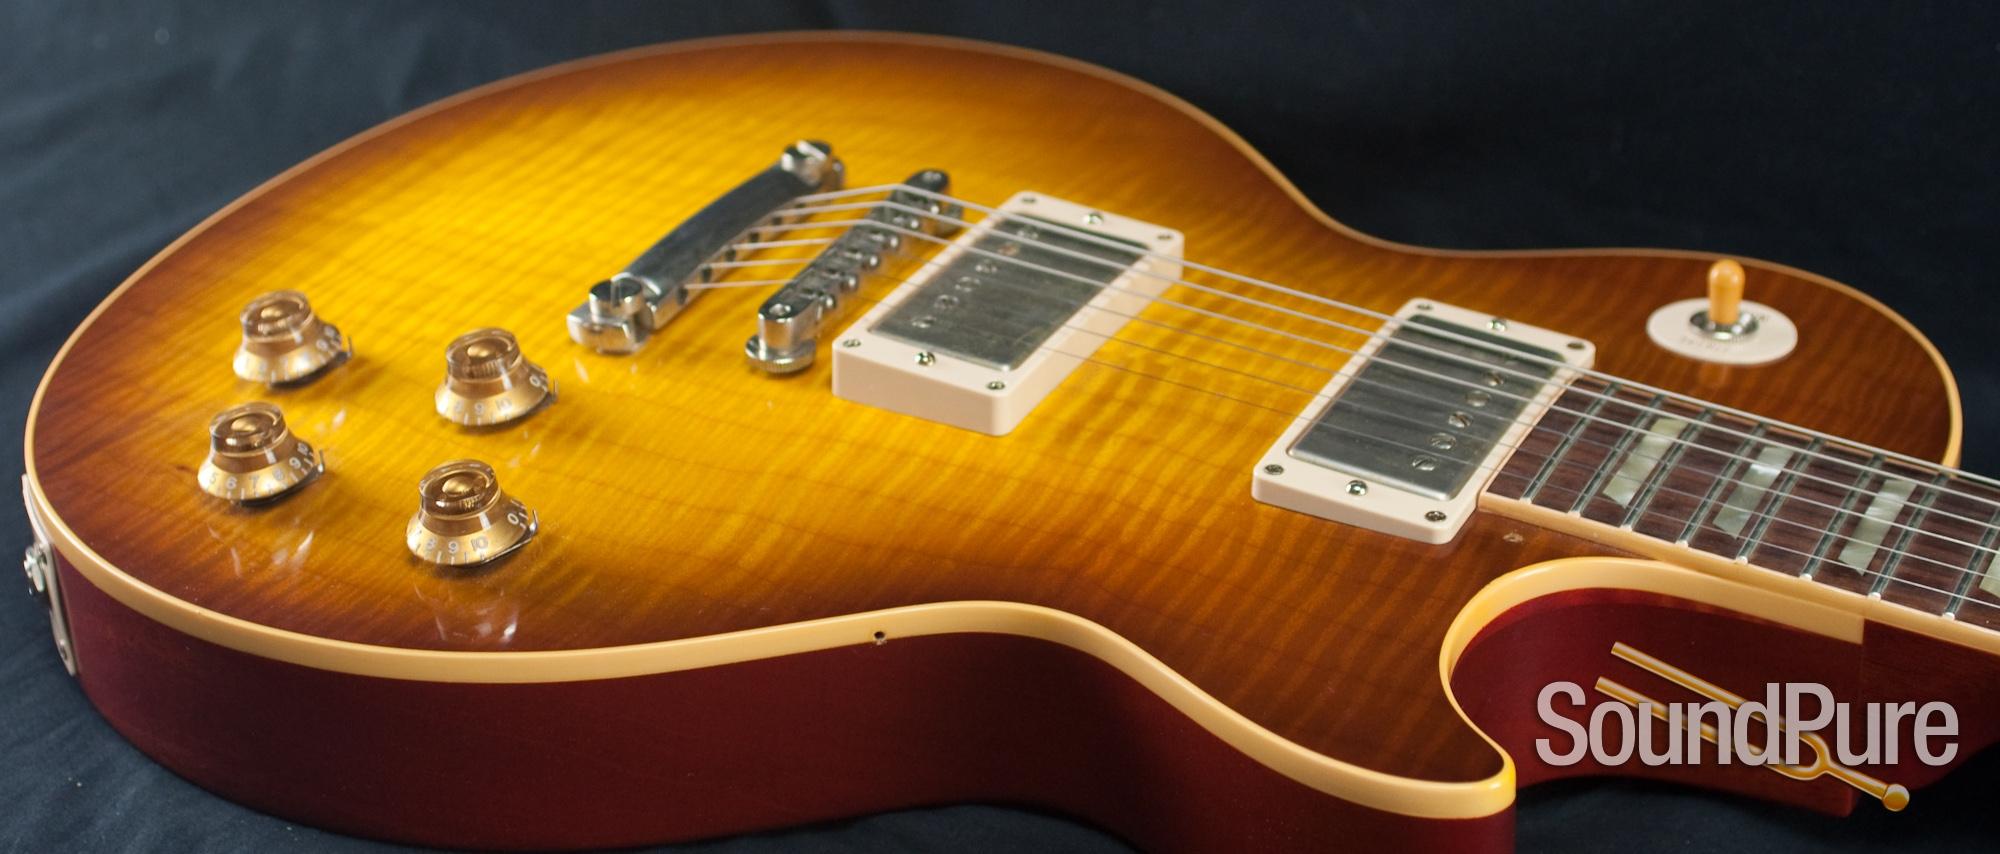 Gibson 2008 Les Paul Custom R9 Reissue Guitar - Used